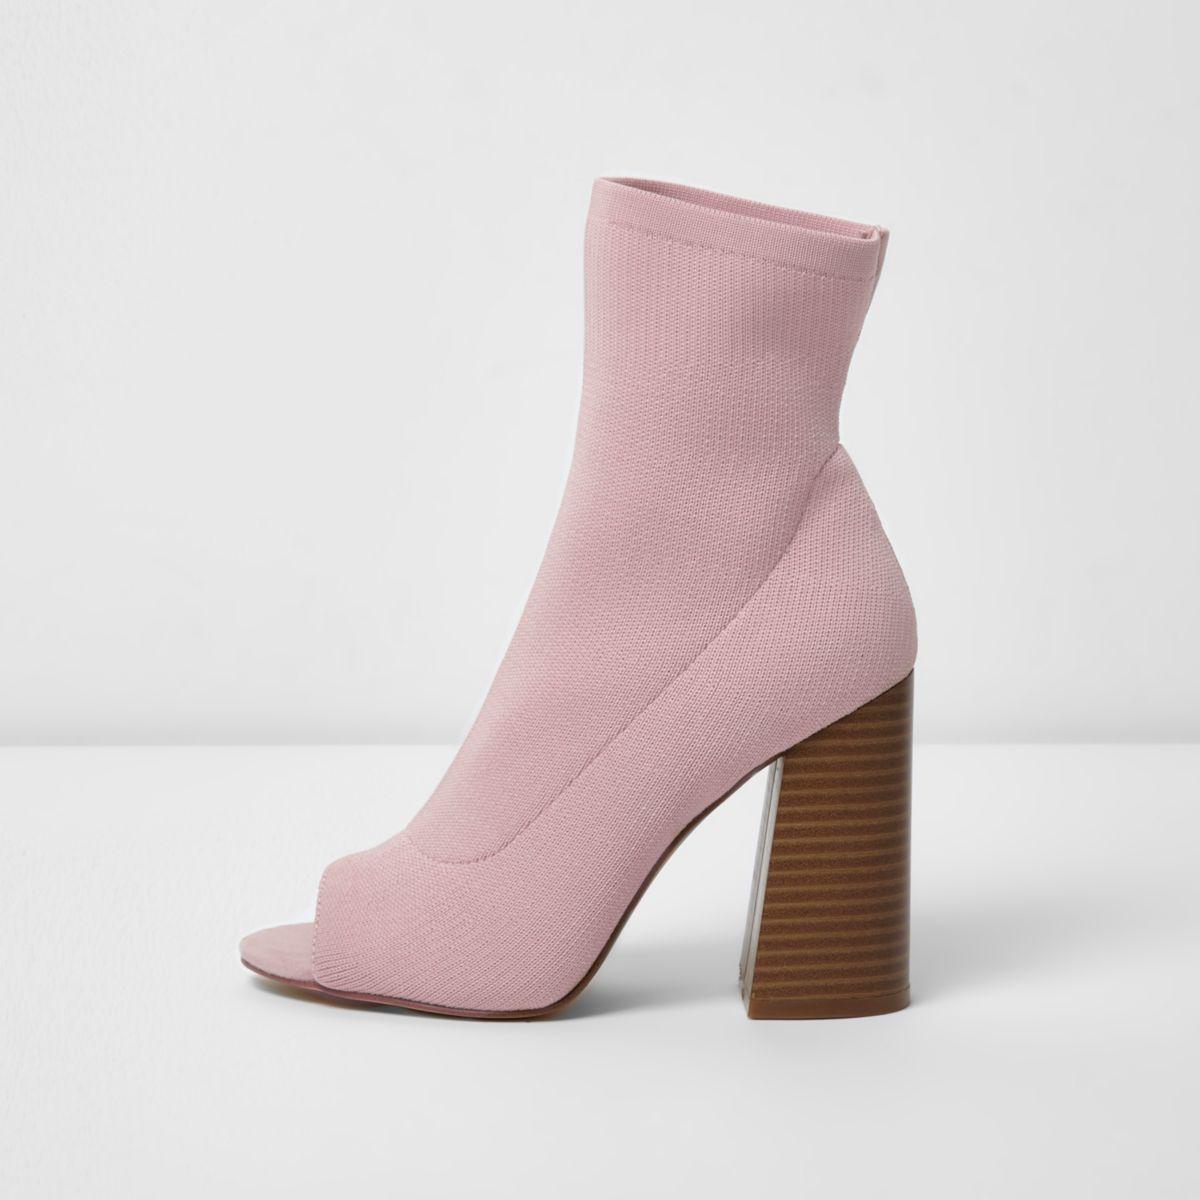 Light pink peep toe heeled knit sock boots